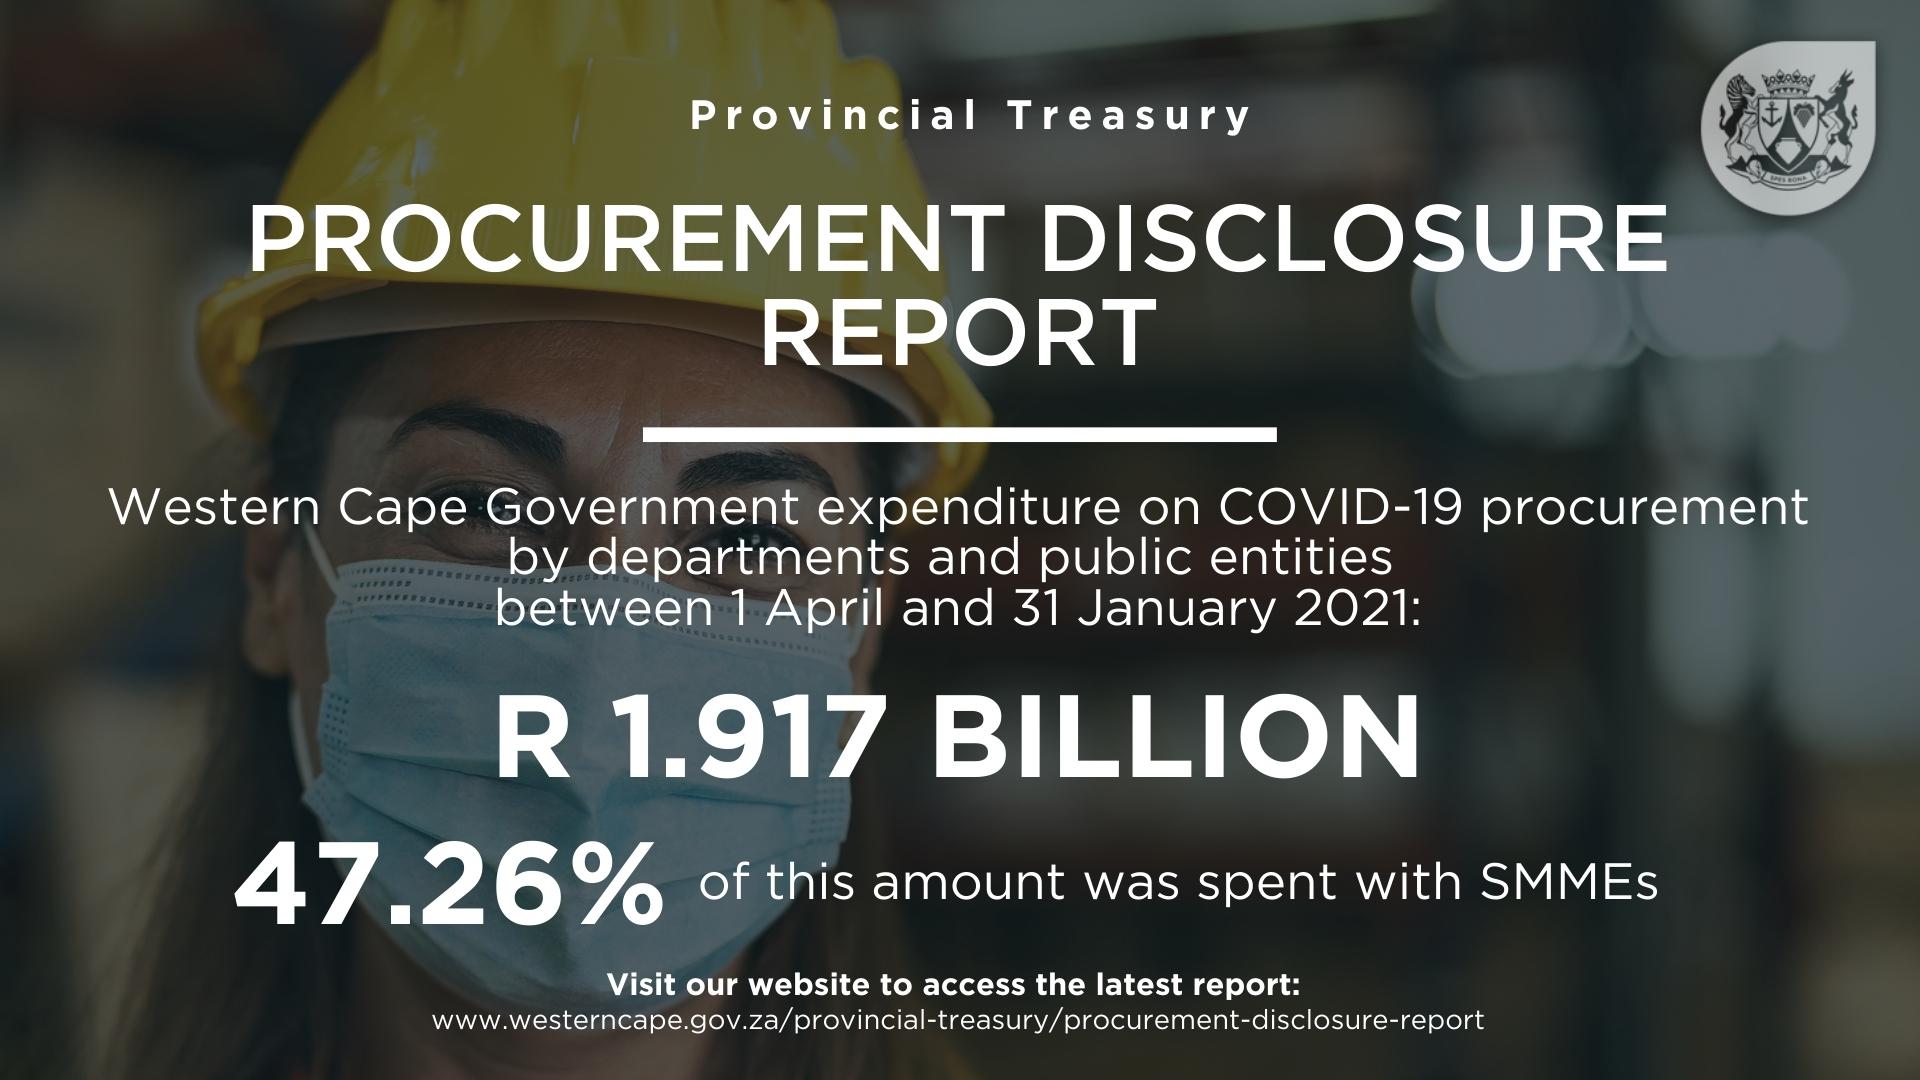 Procurement Disclosure Report January 2021